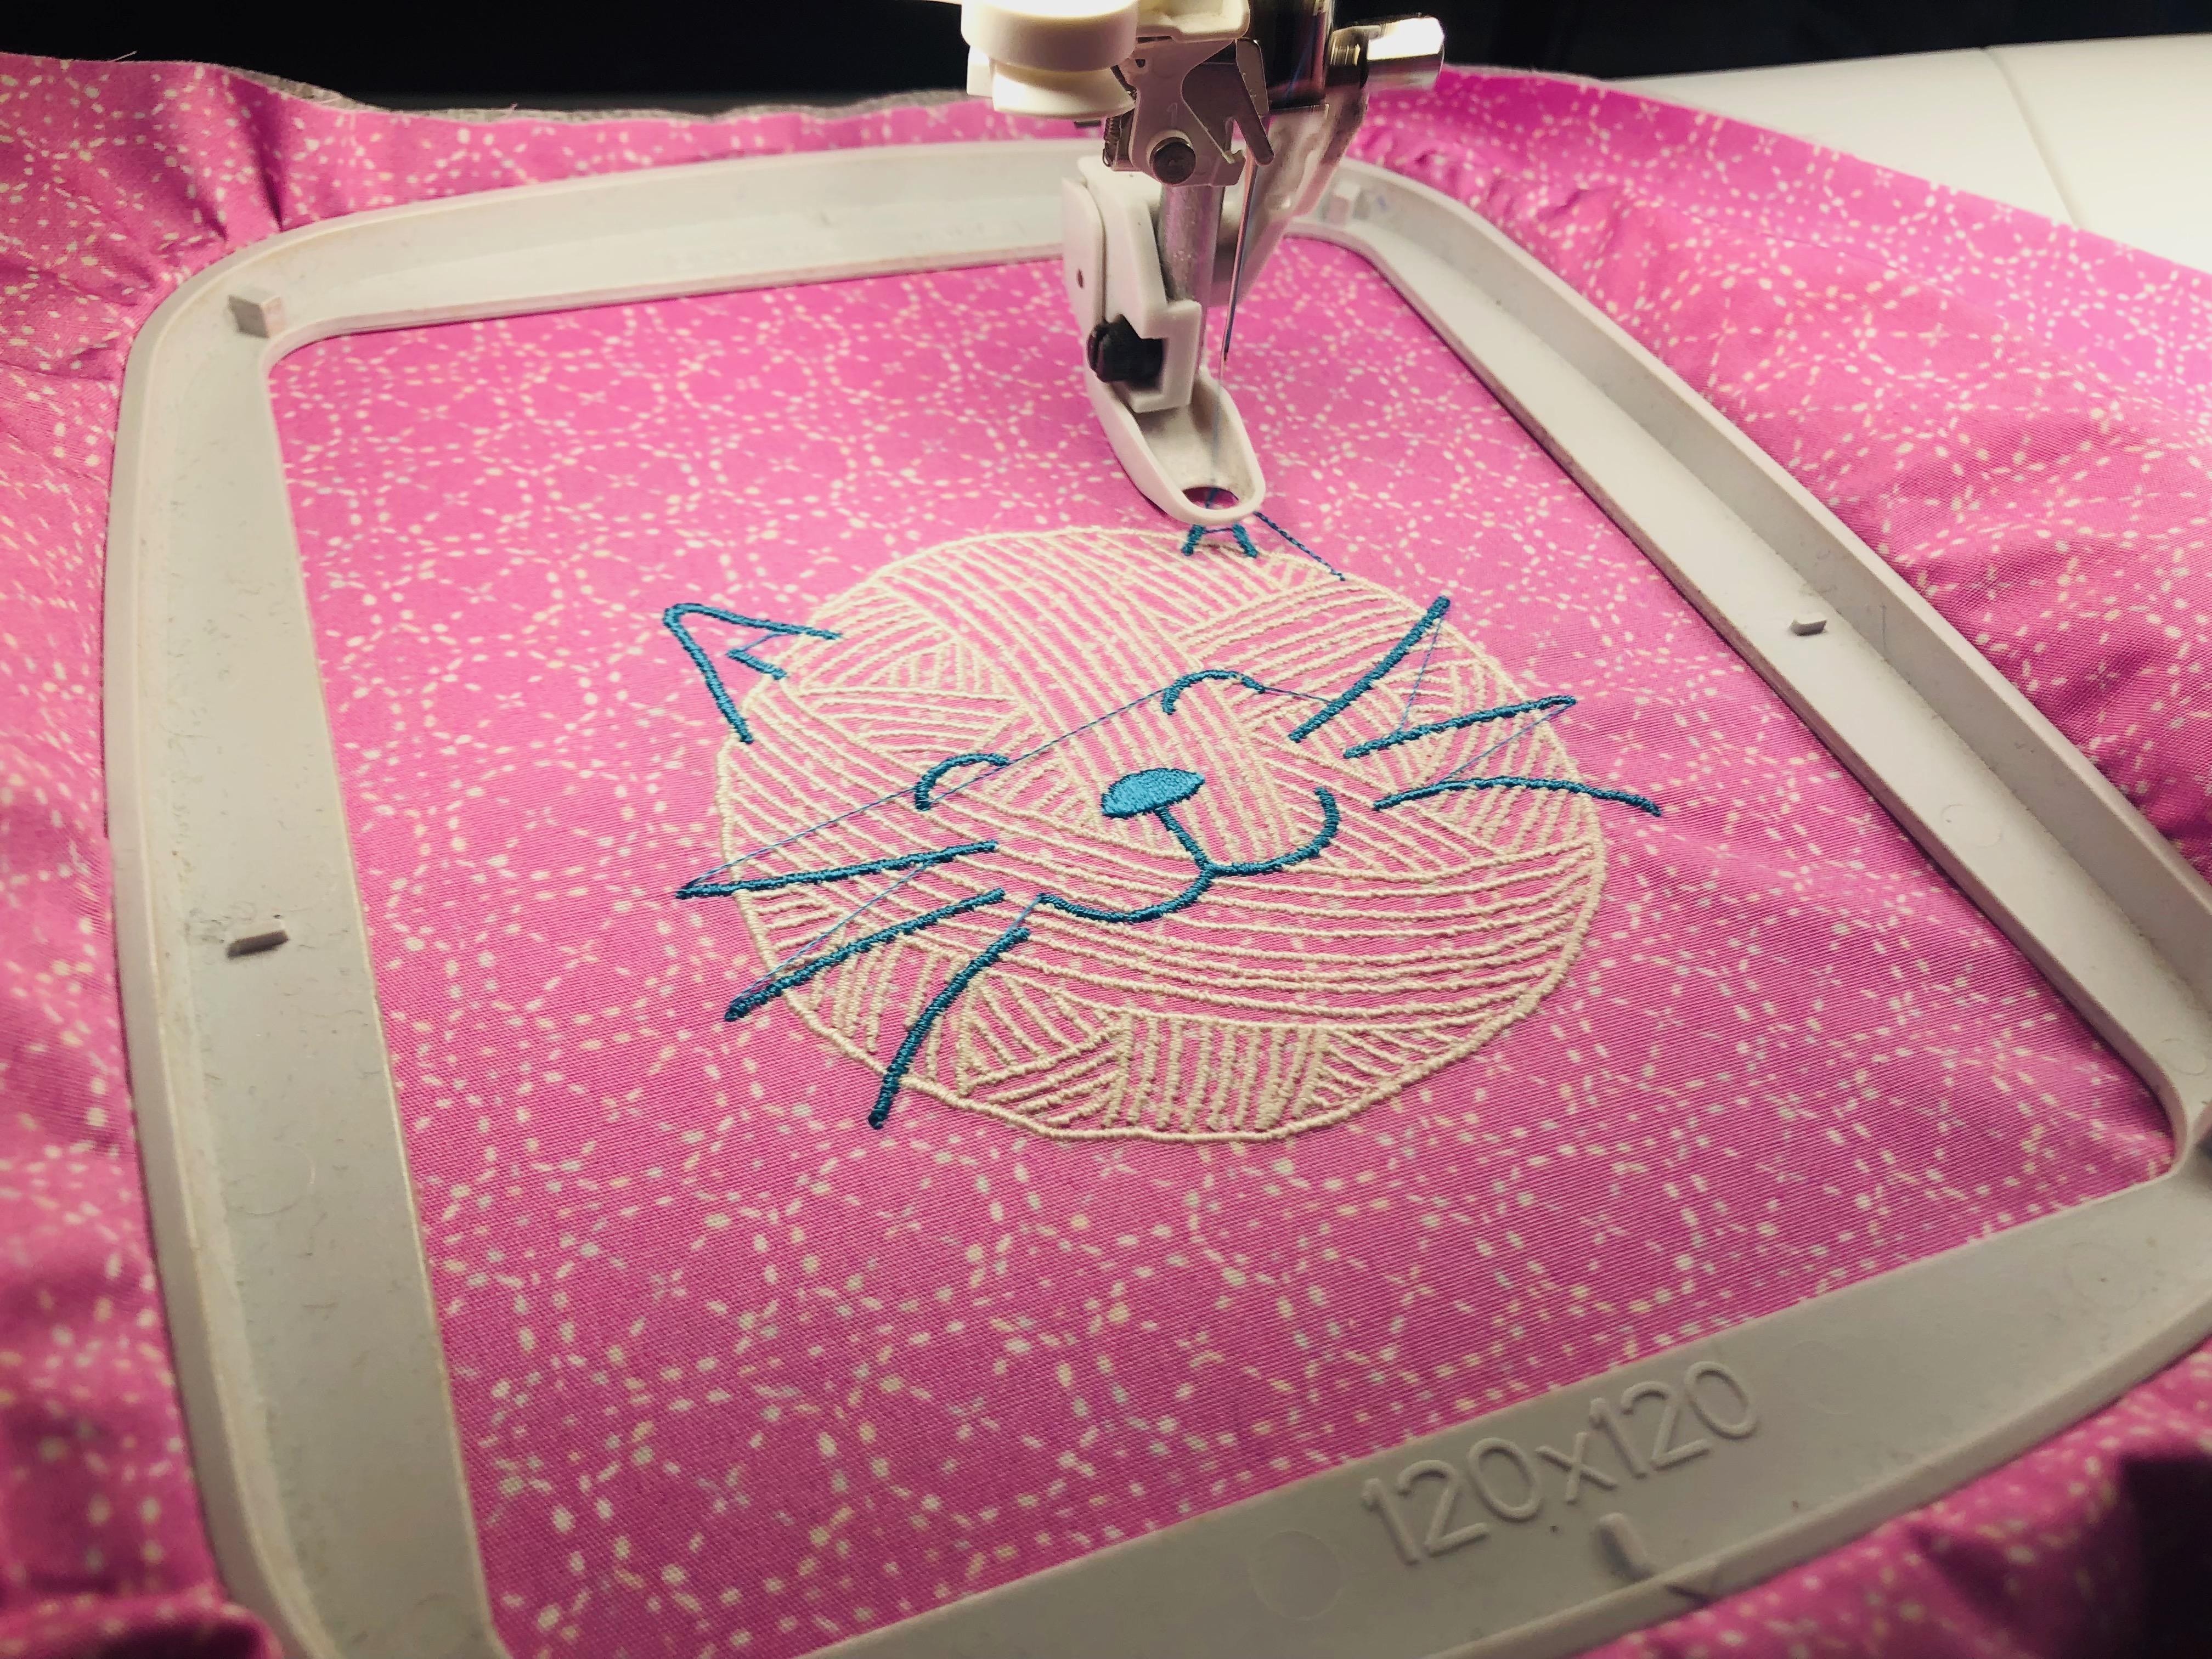 yarn cat embroidery on zippered organizer